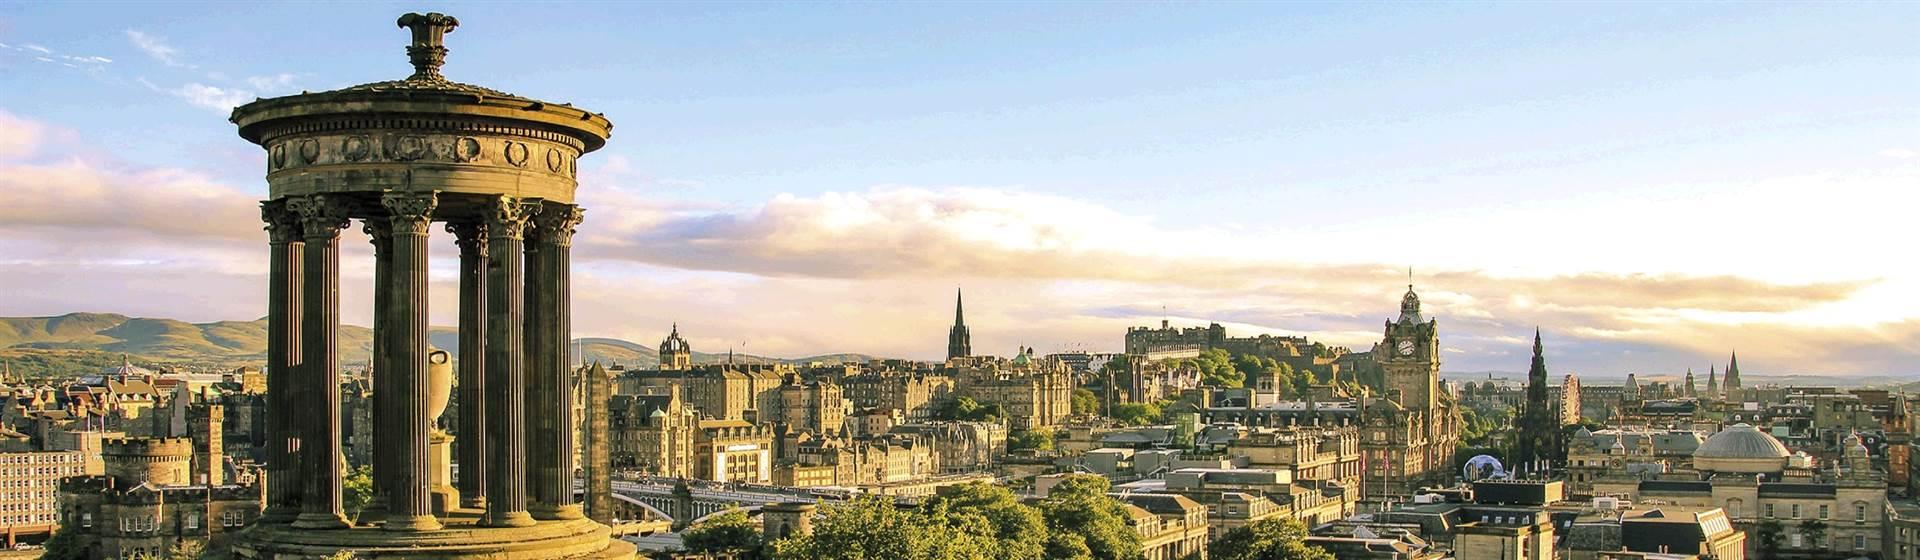 Gretna Green and Edinburgh